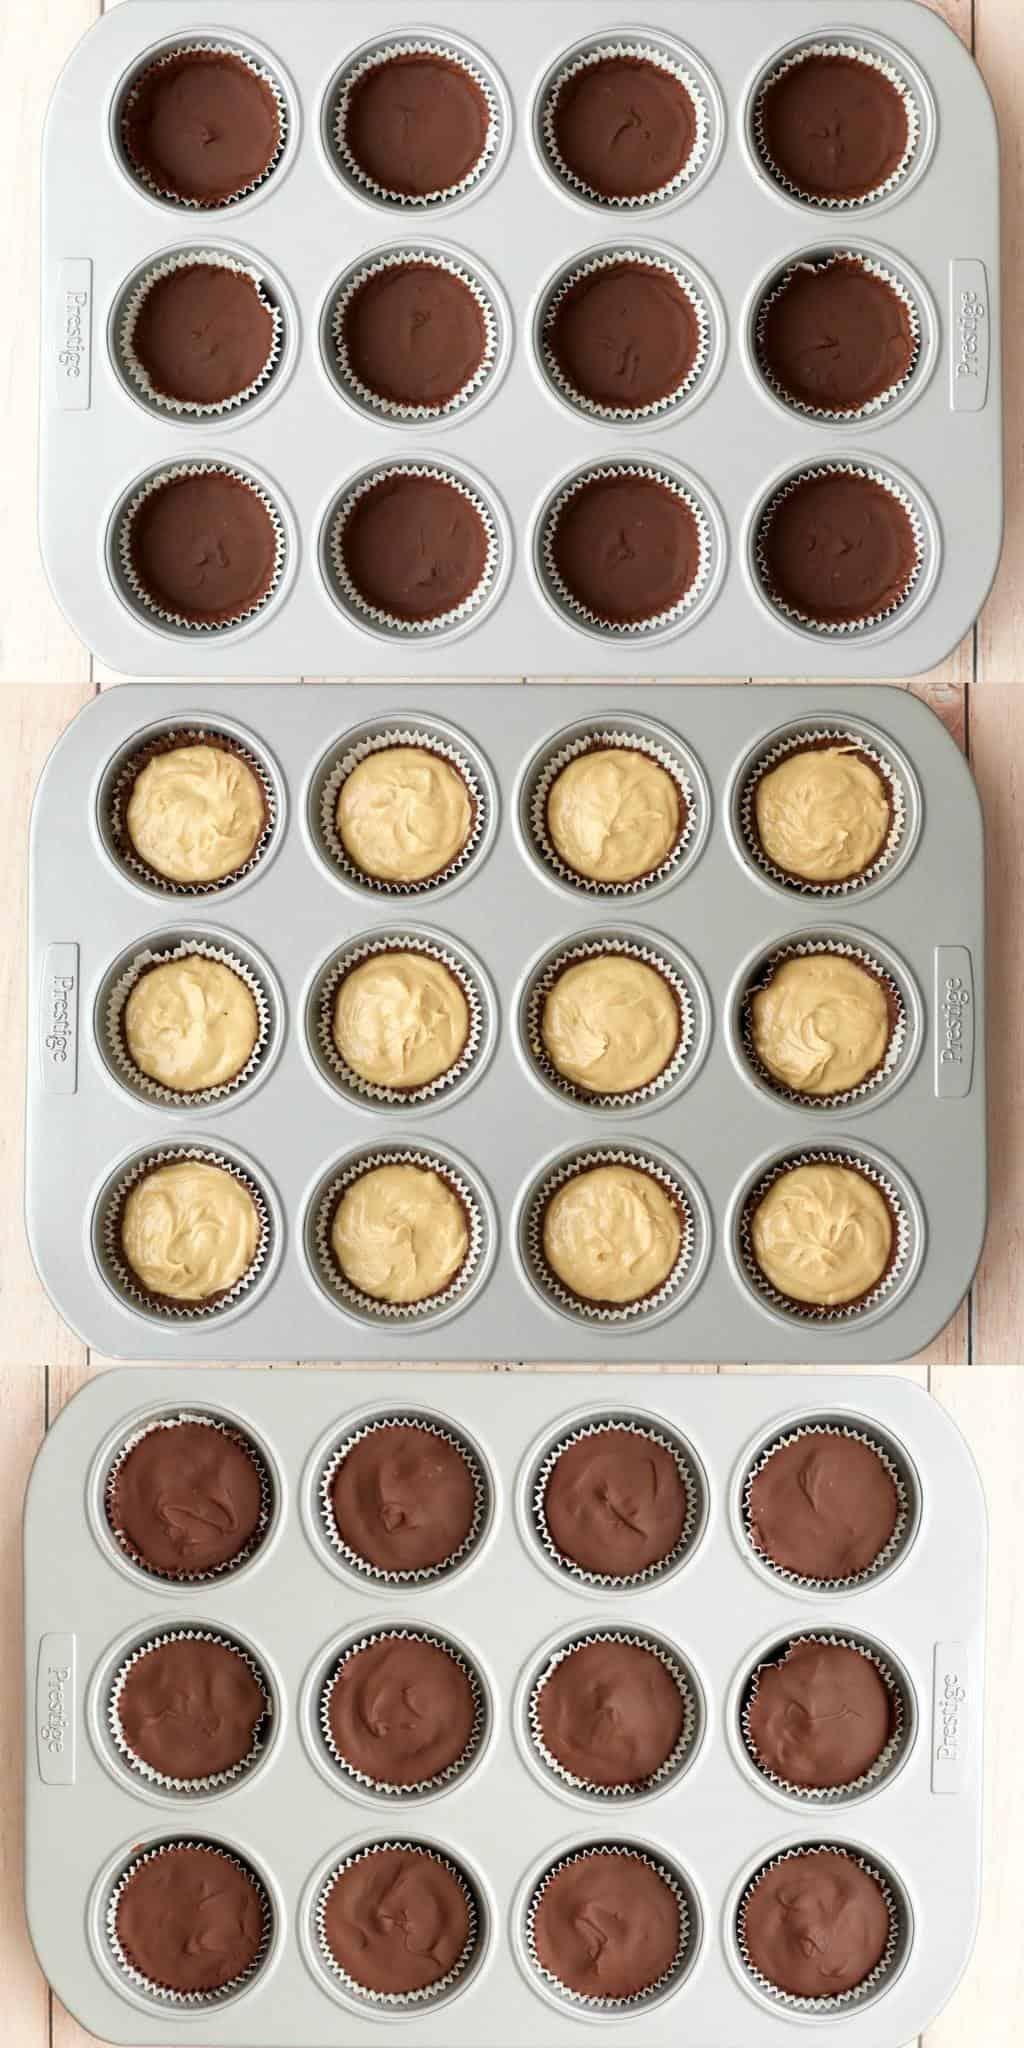 Making Vegan Peanut Butter Cups #vegan #lovingitvegan #dessert